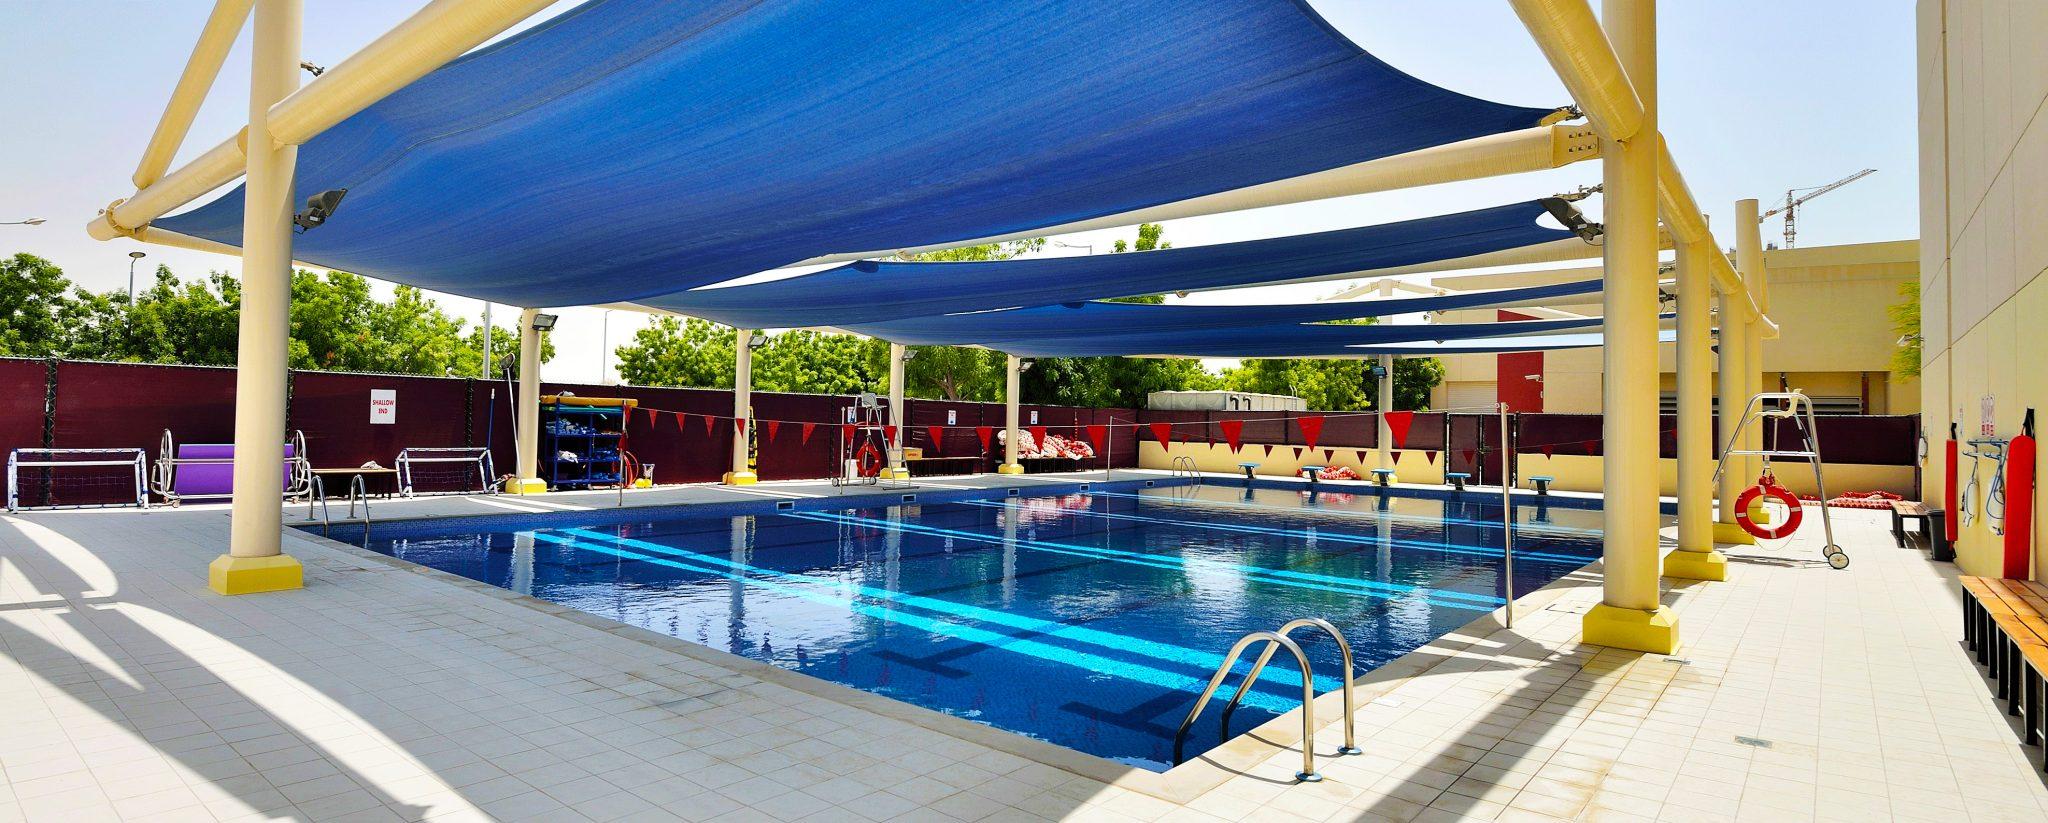 Gems Bradenton Preparatory Academy Dubai Sports City The Review